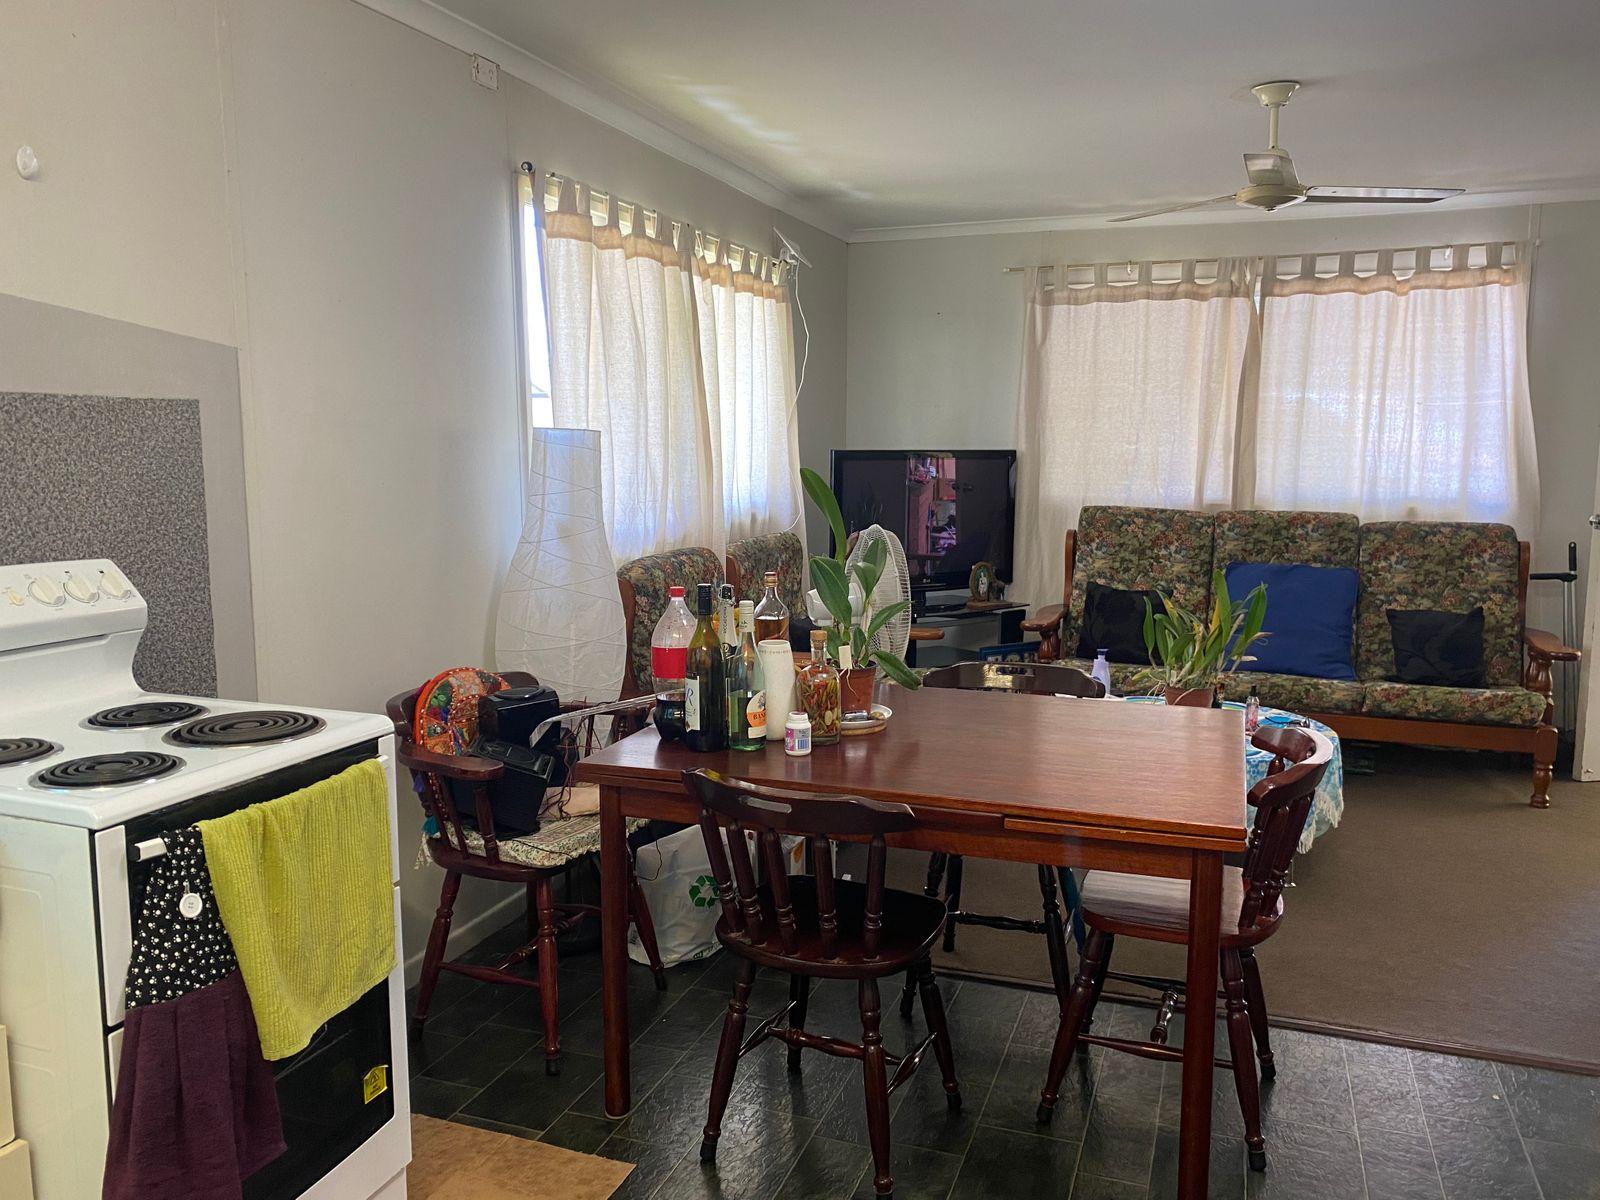 2 Elizabeth Street, Sarina, QLD 4737